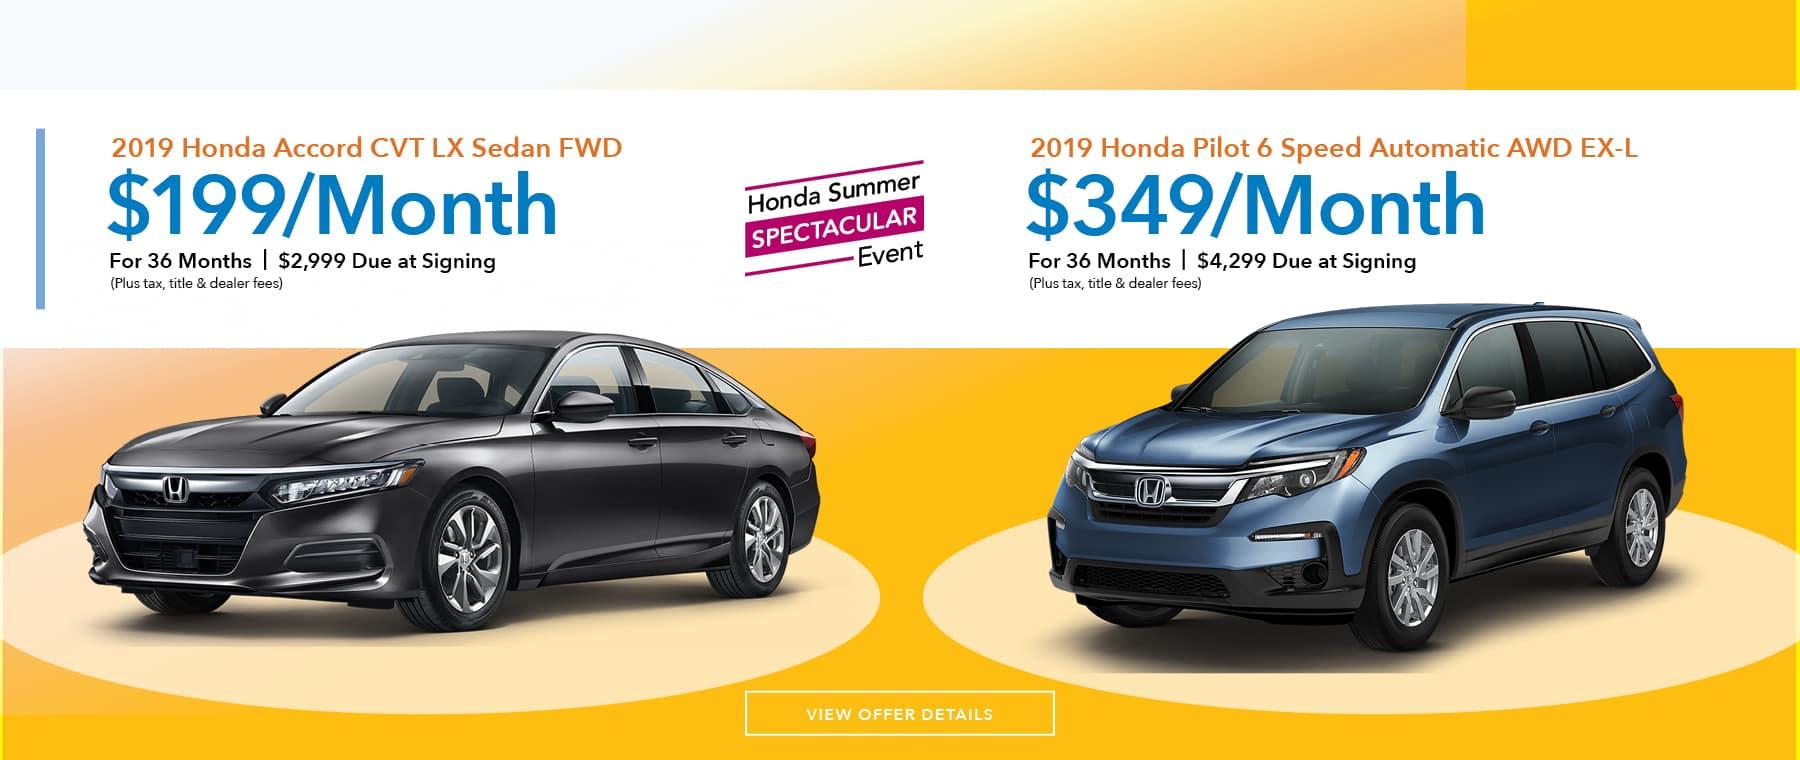 Honda Dealers Cincinnati >> Honda Dealers Dayton Ohio 2019 Deals At Germain Honda Of Beavercreek